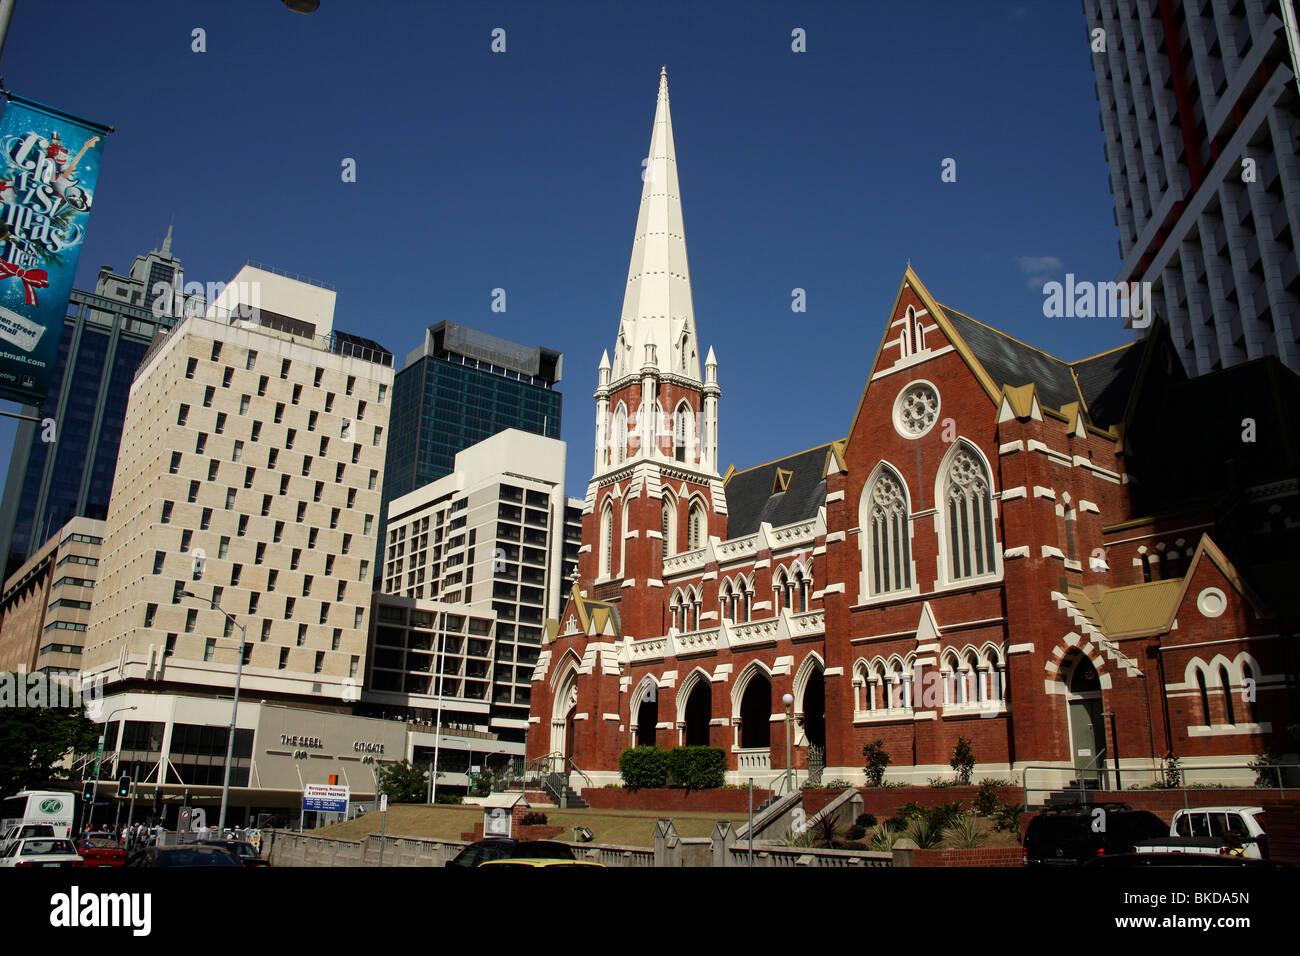 Albert Street Uniting Church in Brisbane, Queensland, Australia - Stock Image